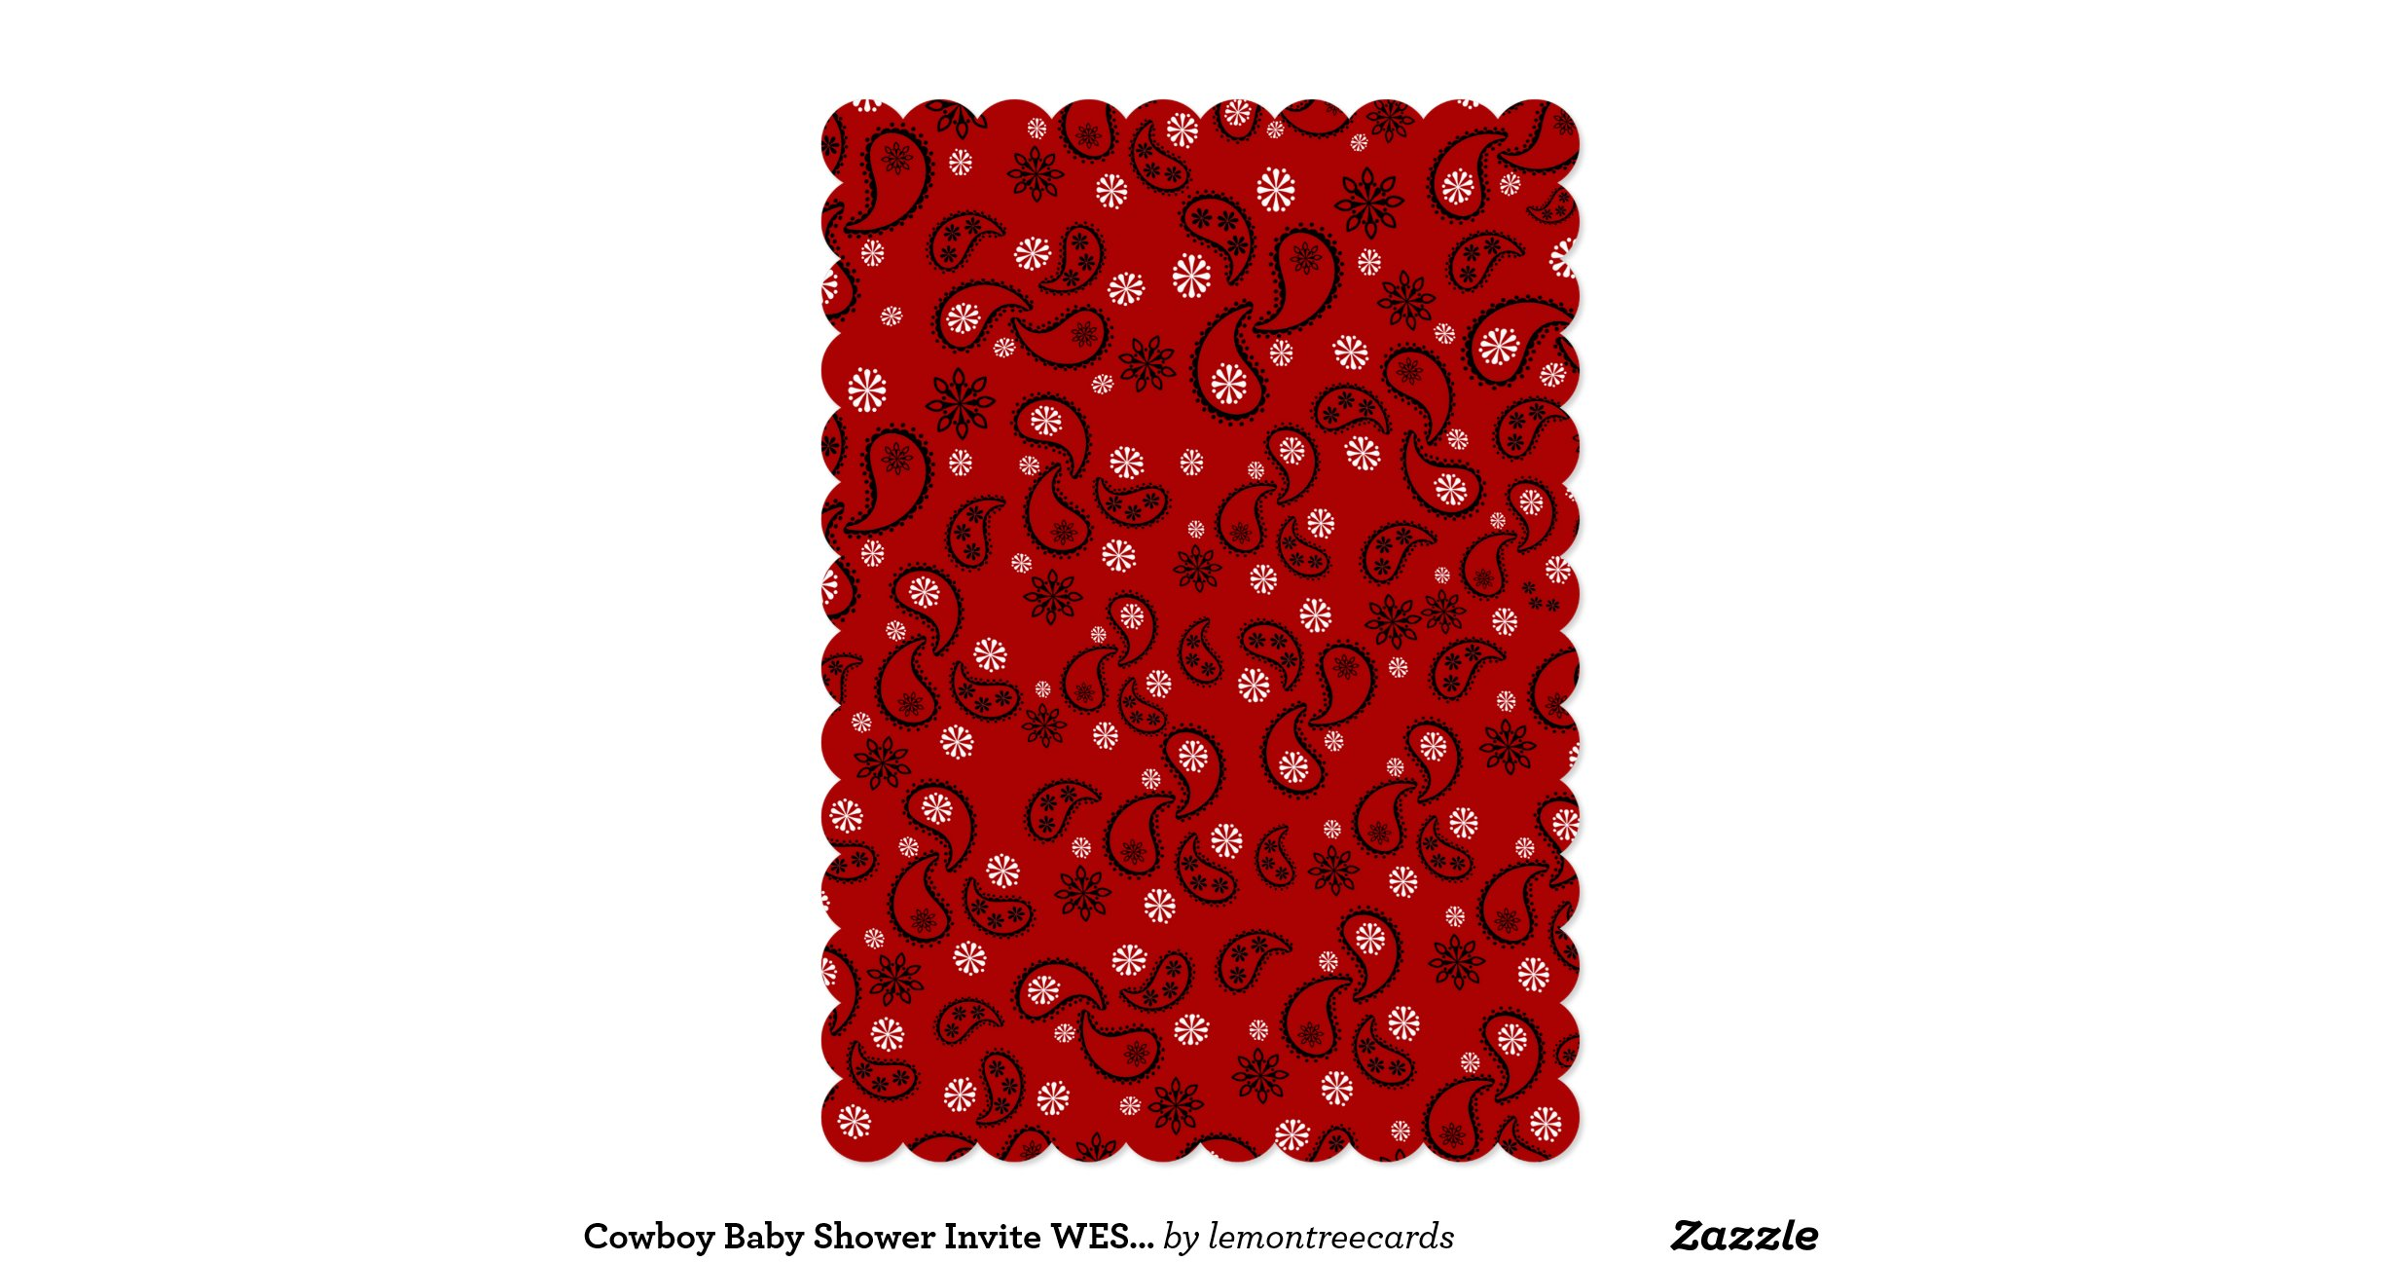 Red Bandana Bathroom Decor: Red bandana cowboy baby shower ...